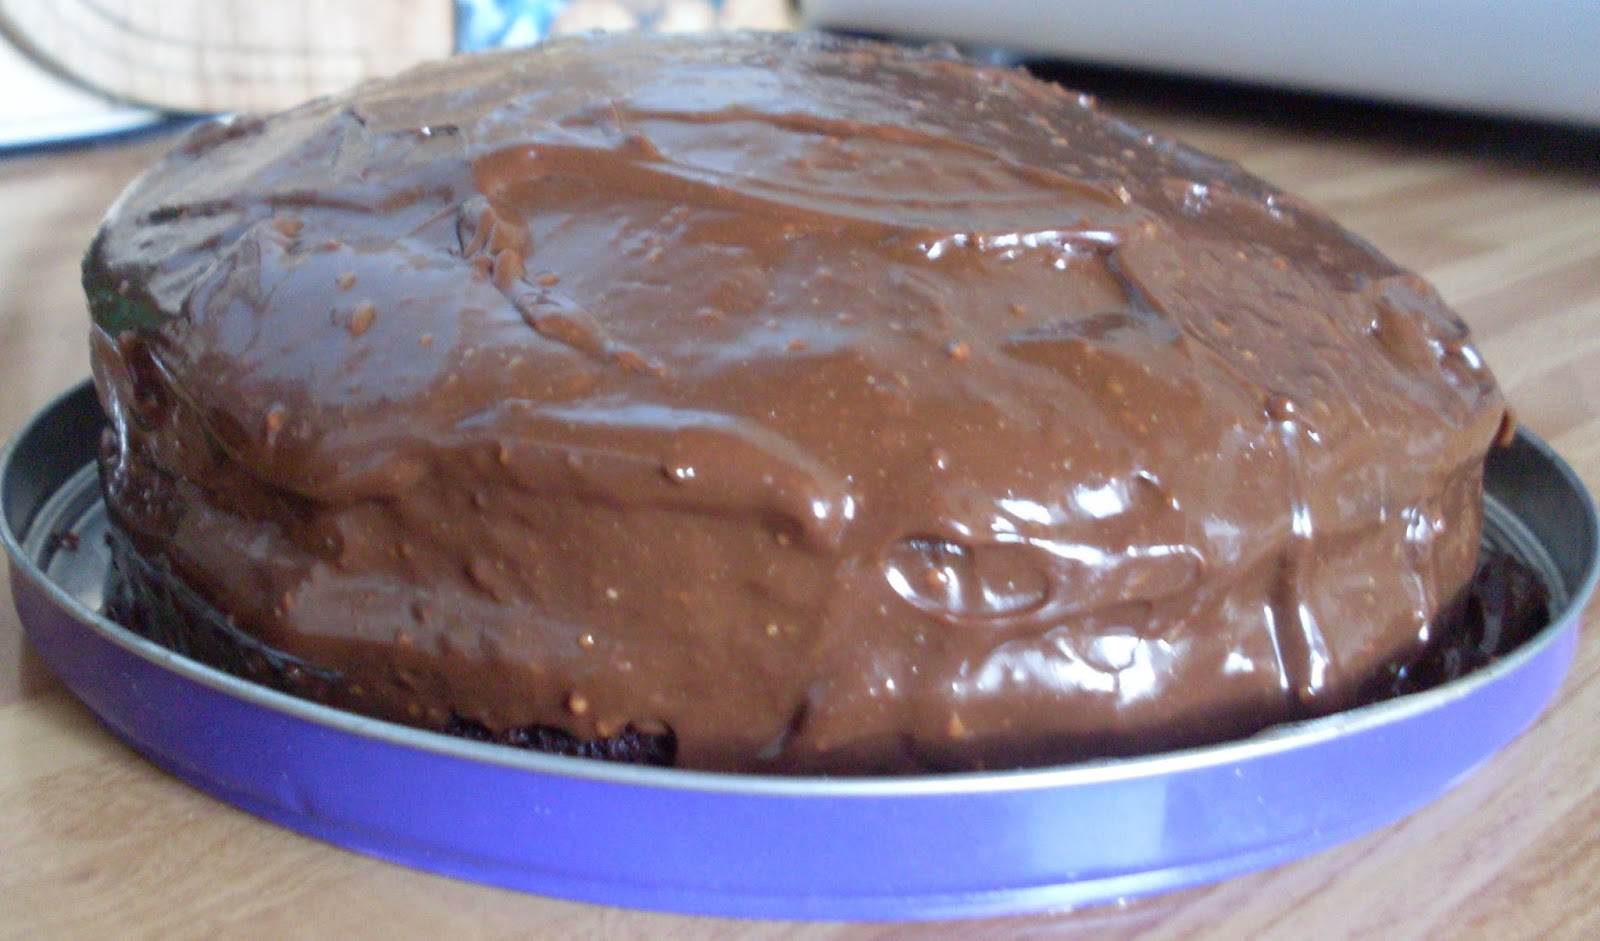 Carnation Caramel Chocolate Fudge Cake